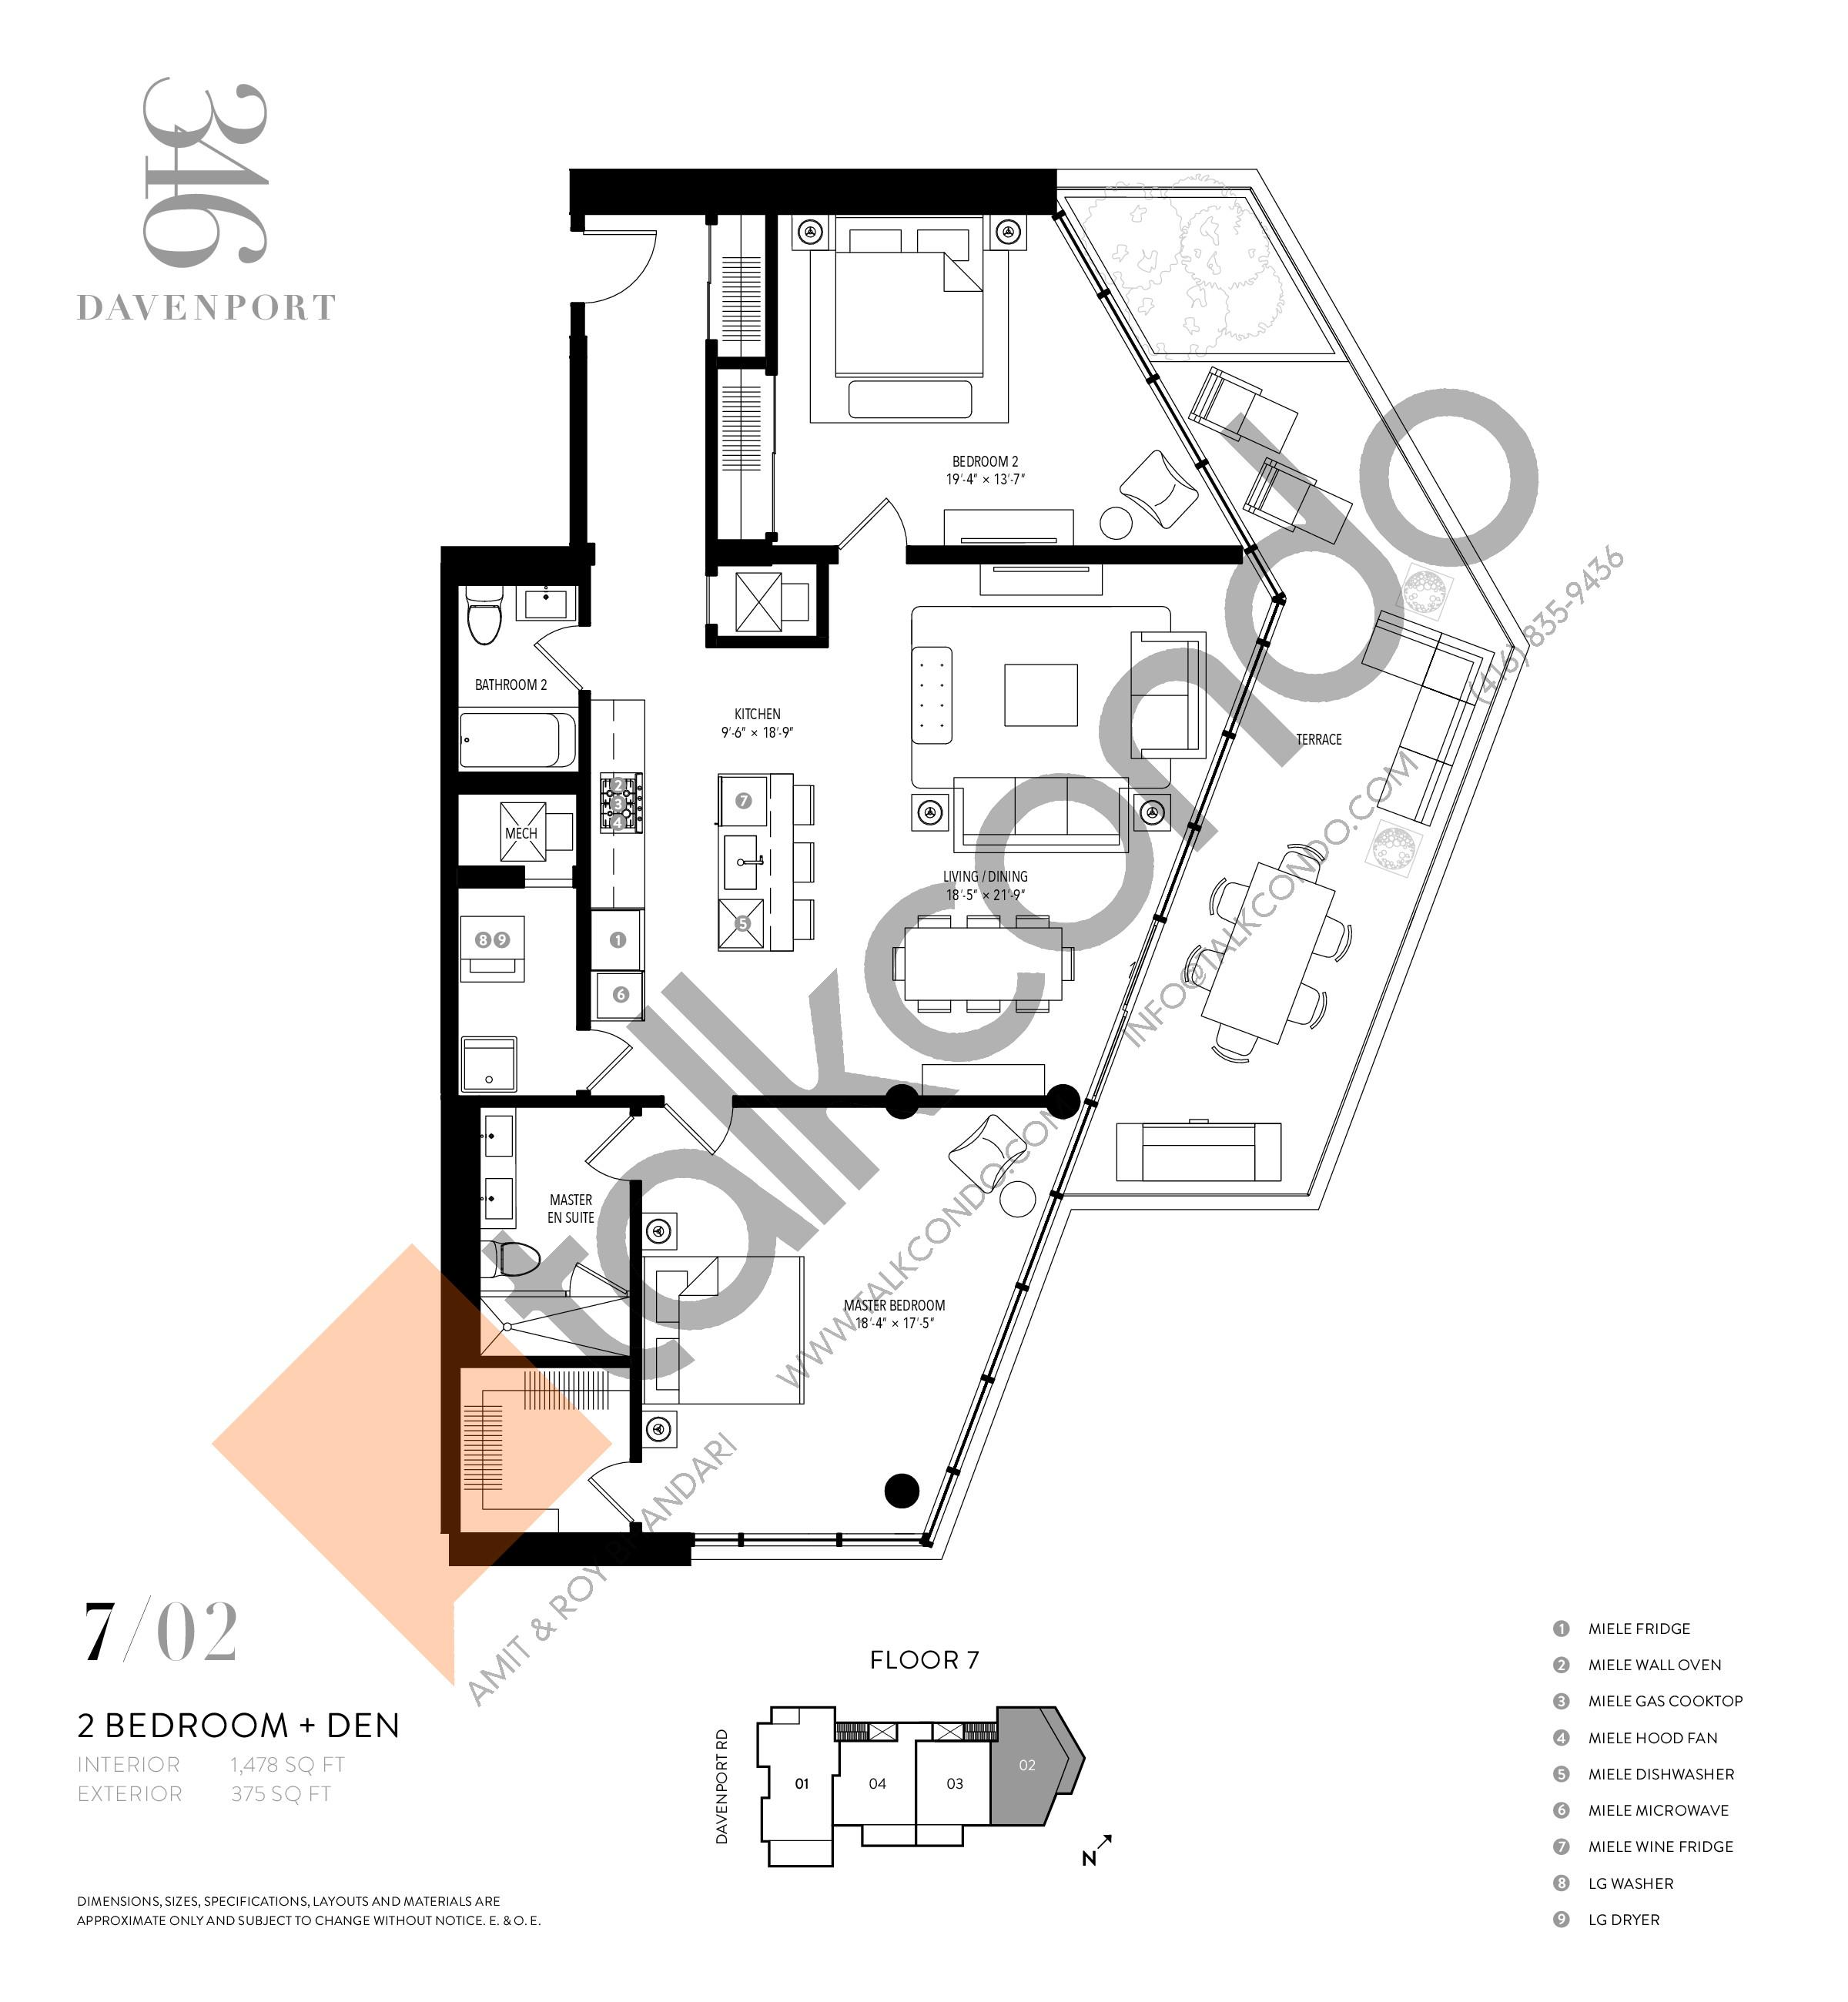 702 Floor Plan at 346 Davenport Condos - 1478 sq.ft